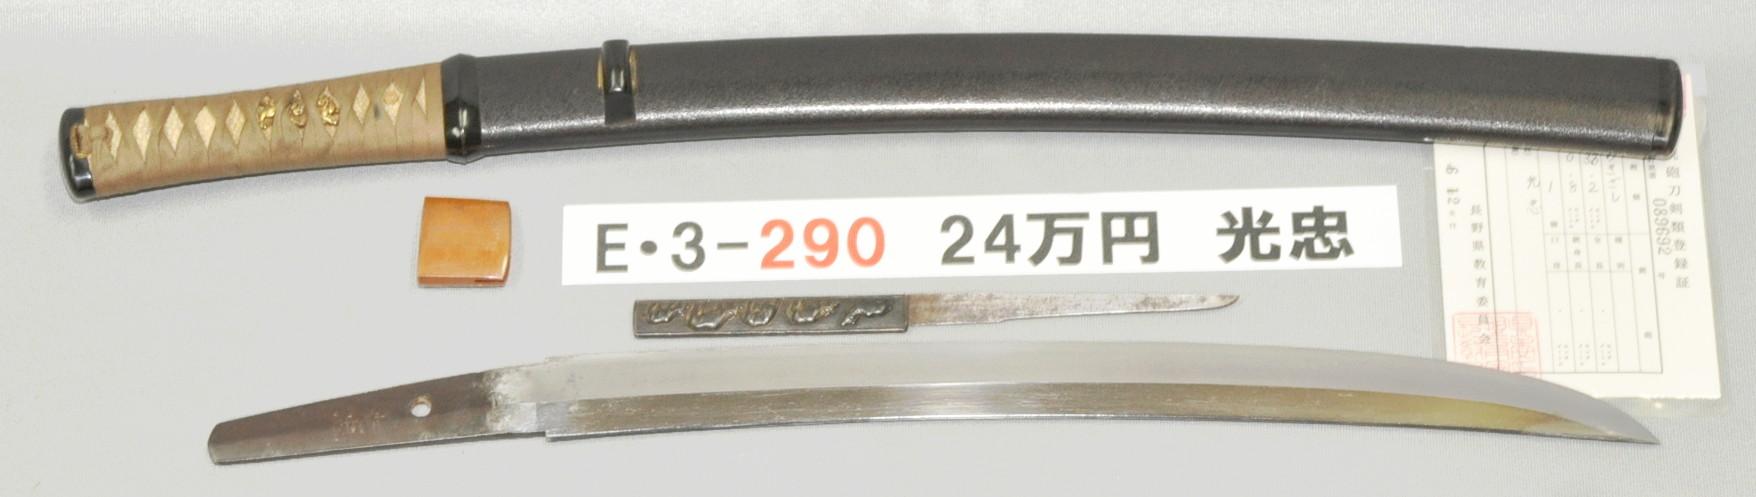 E3290